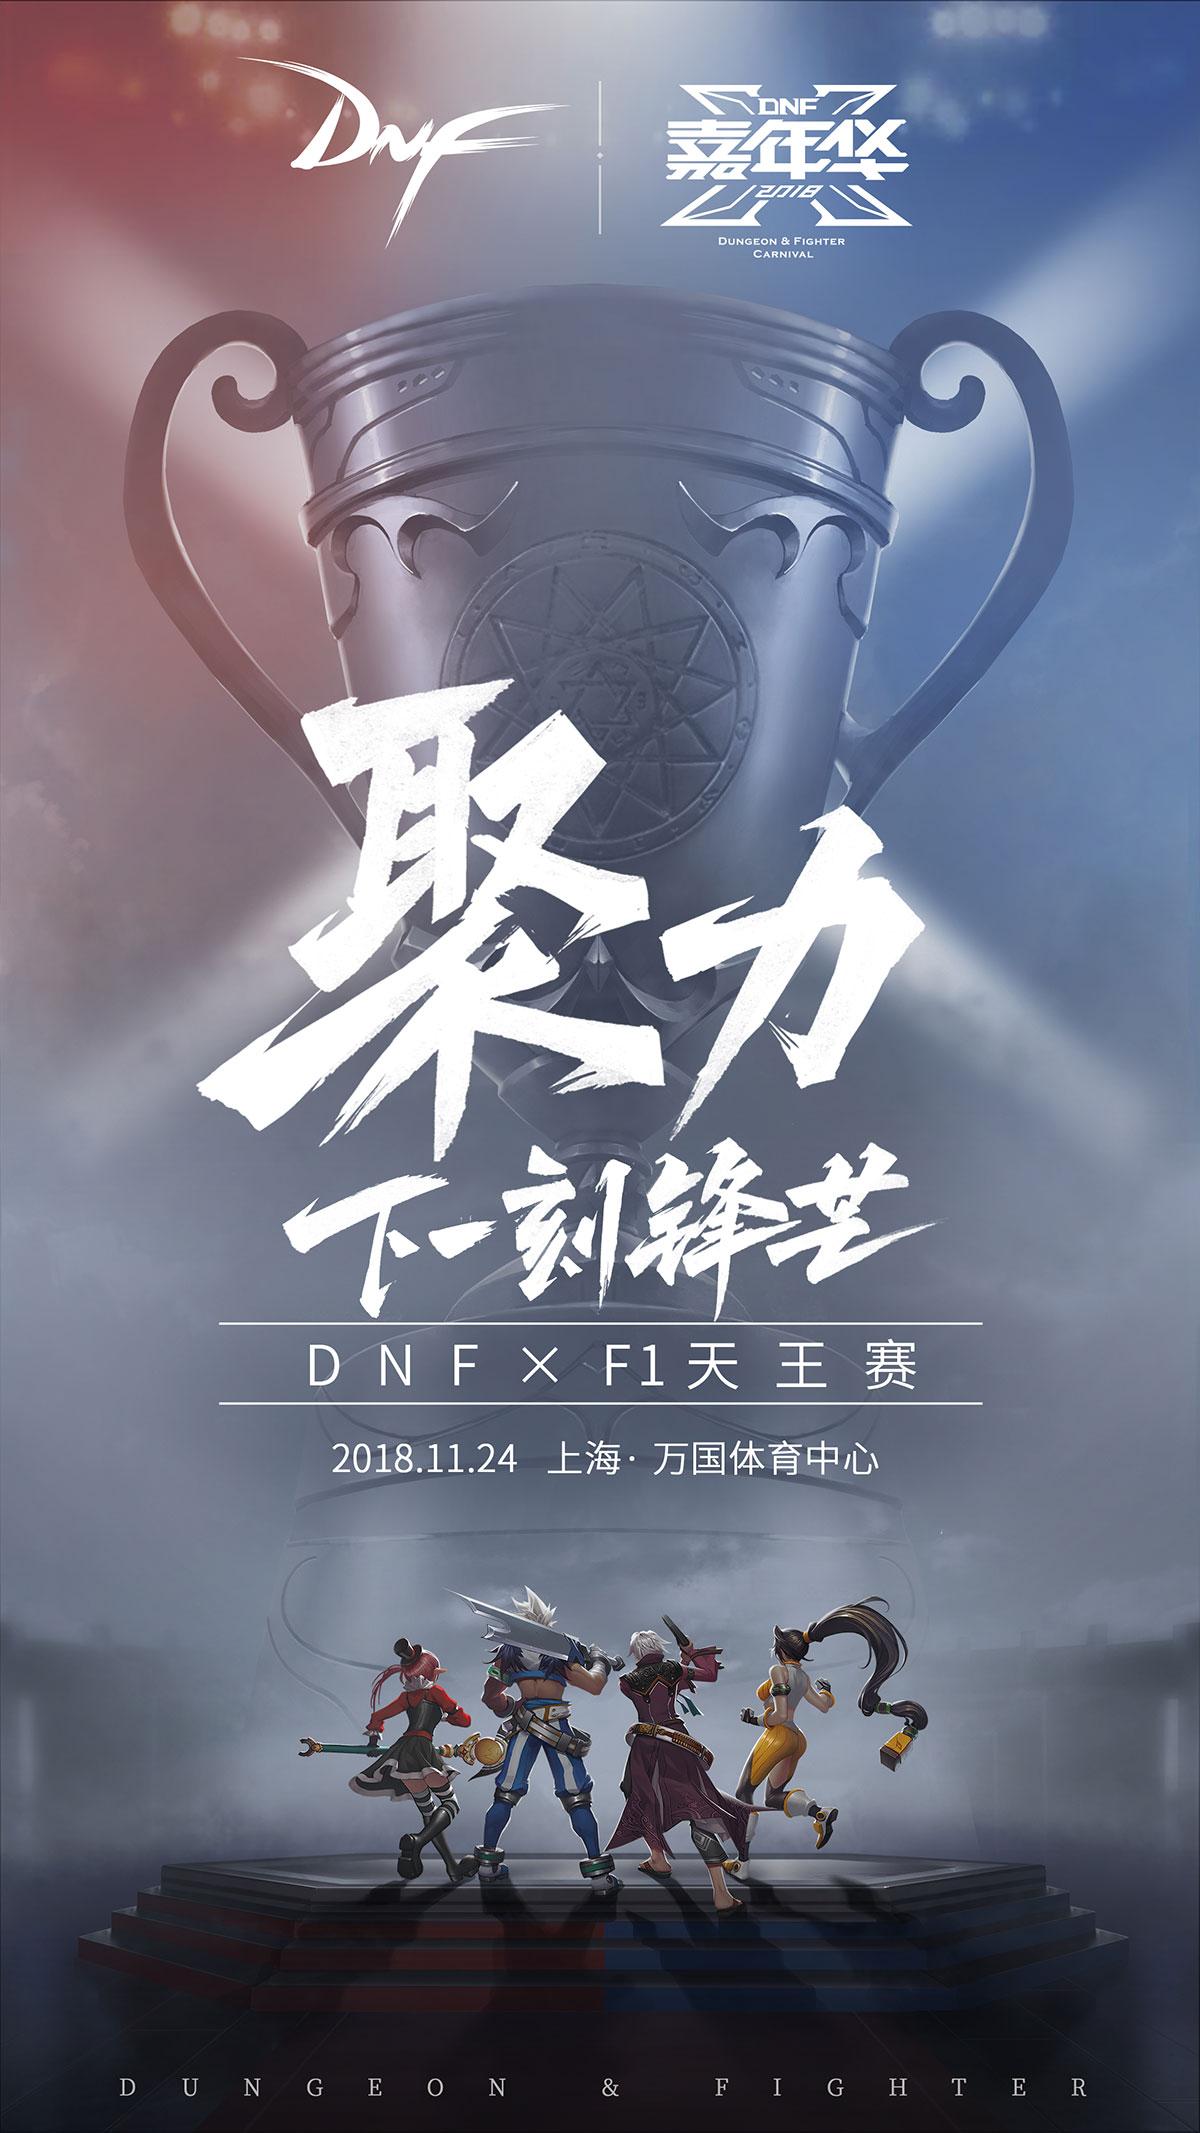 DNF X键系列海报新篇发布